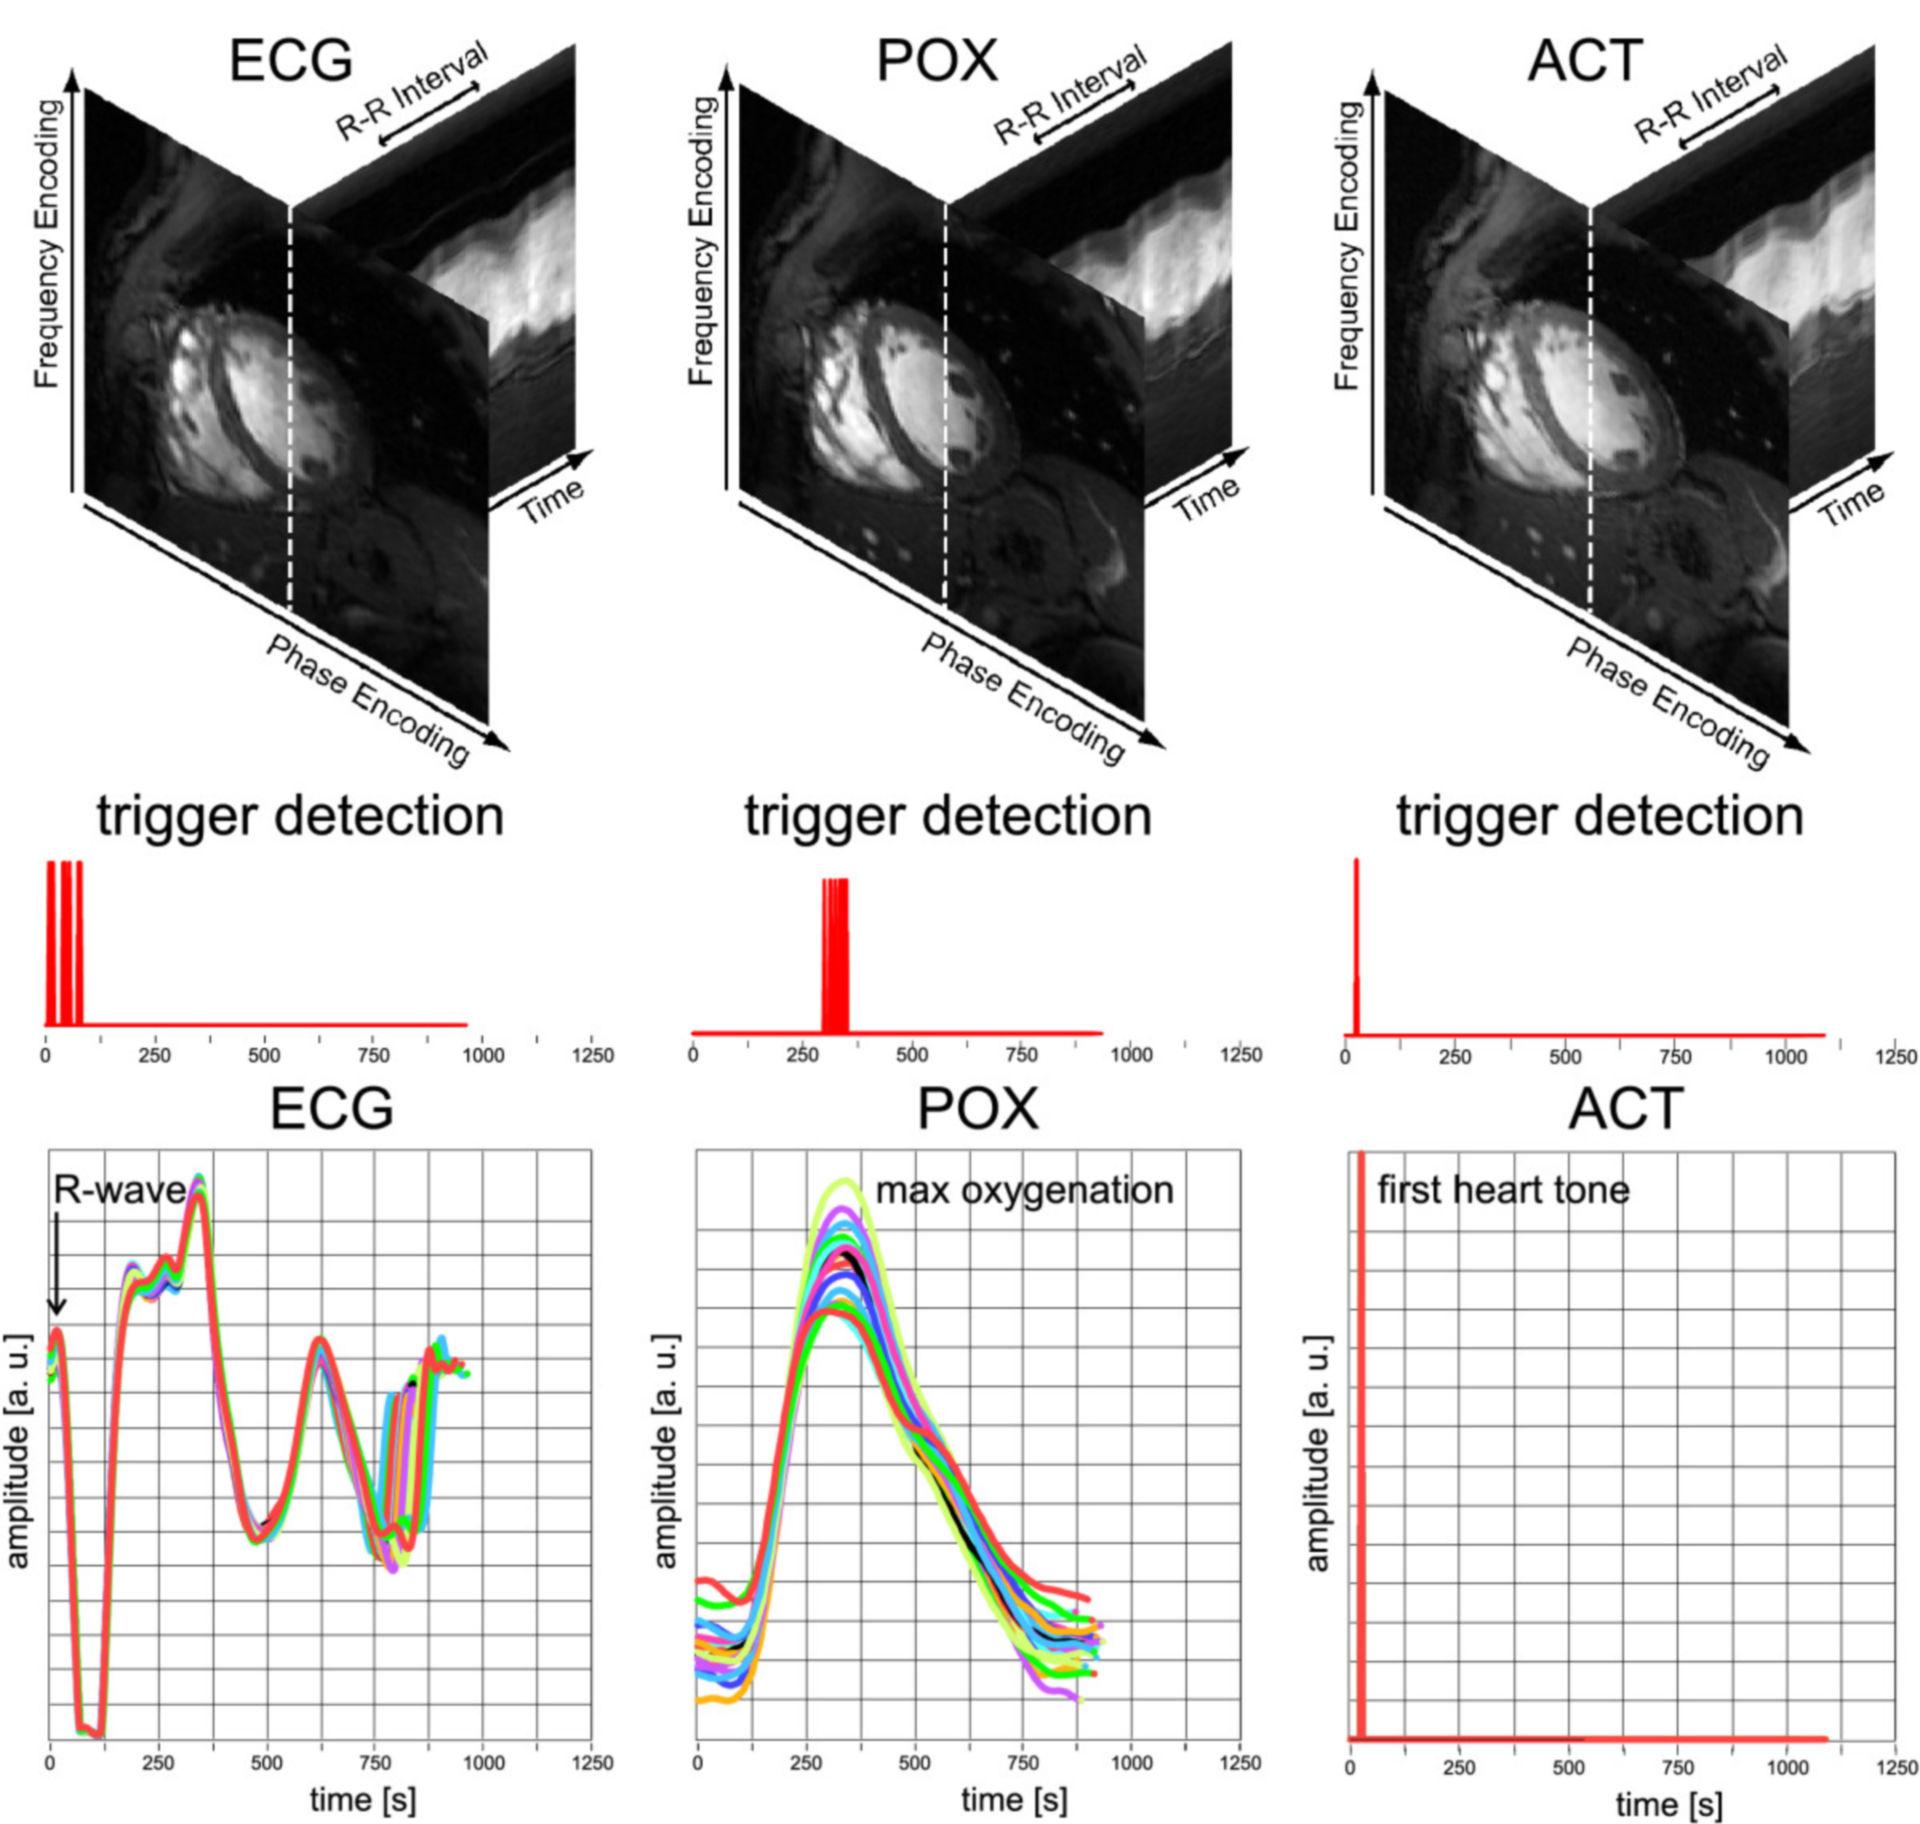 Cardiovacular MRT: Example of correct ECG trigger detection